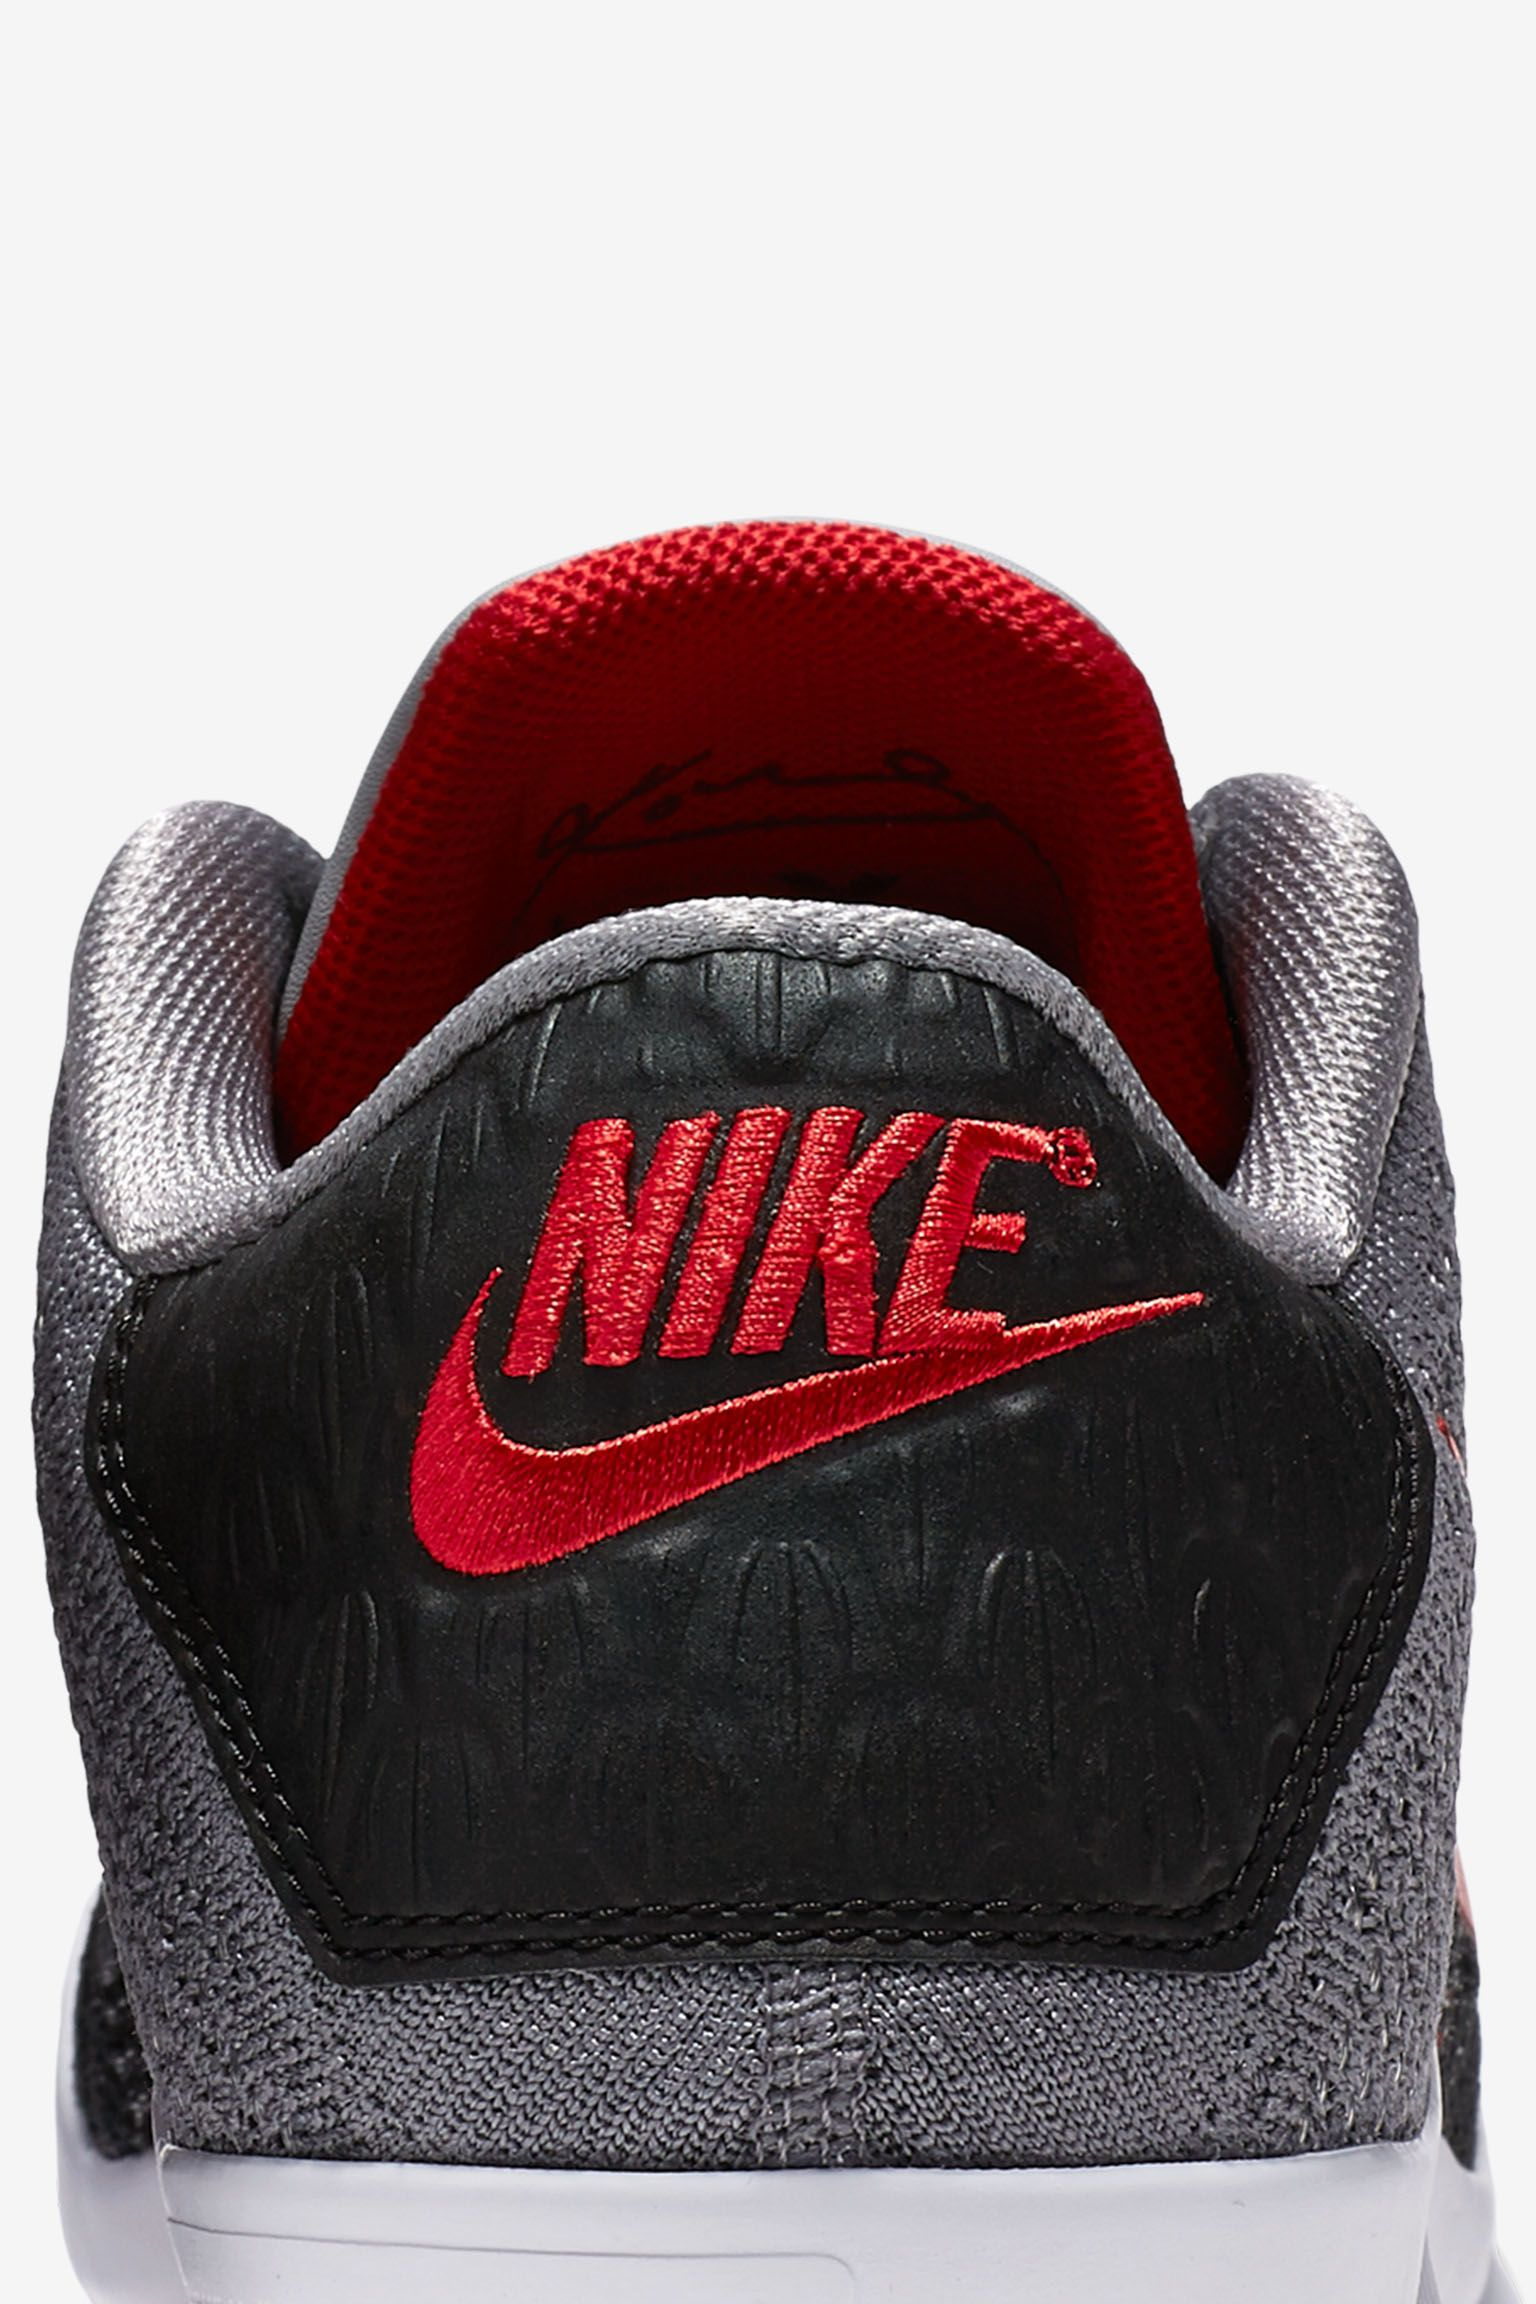 Nike Kobe 11 Elite 'Tinker Muse'